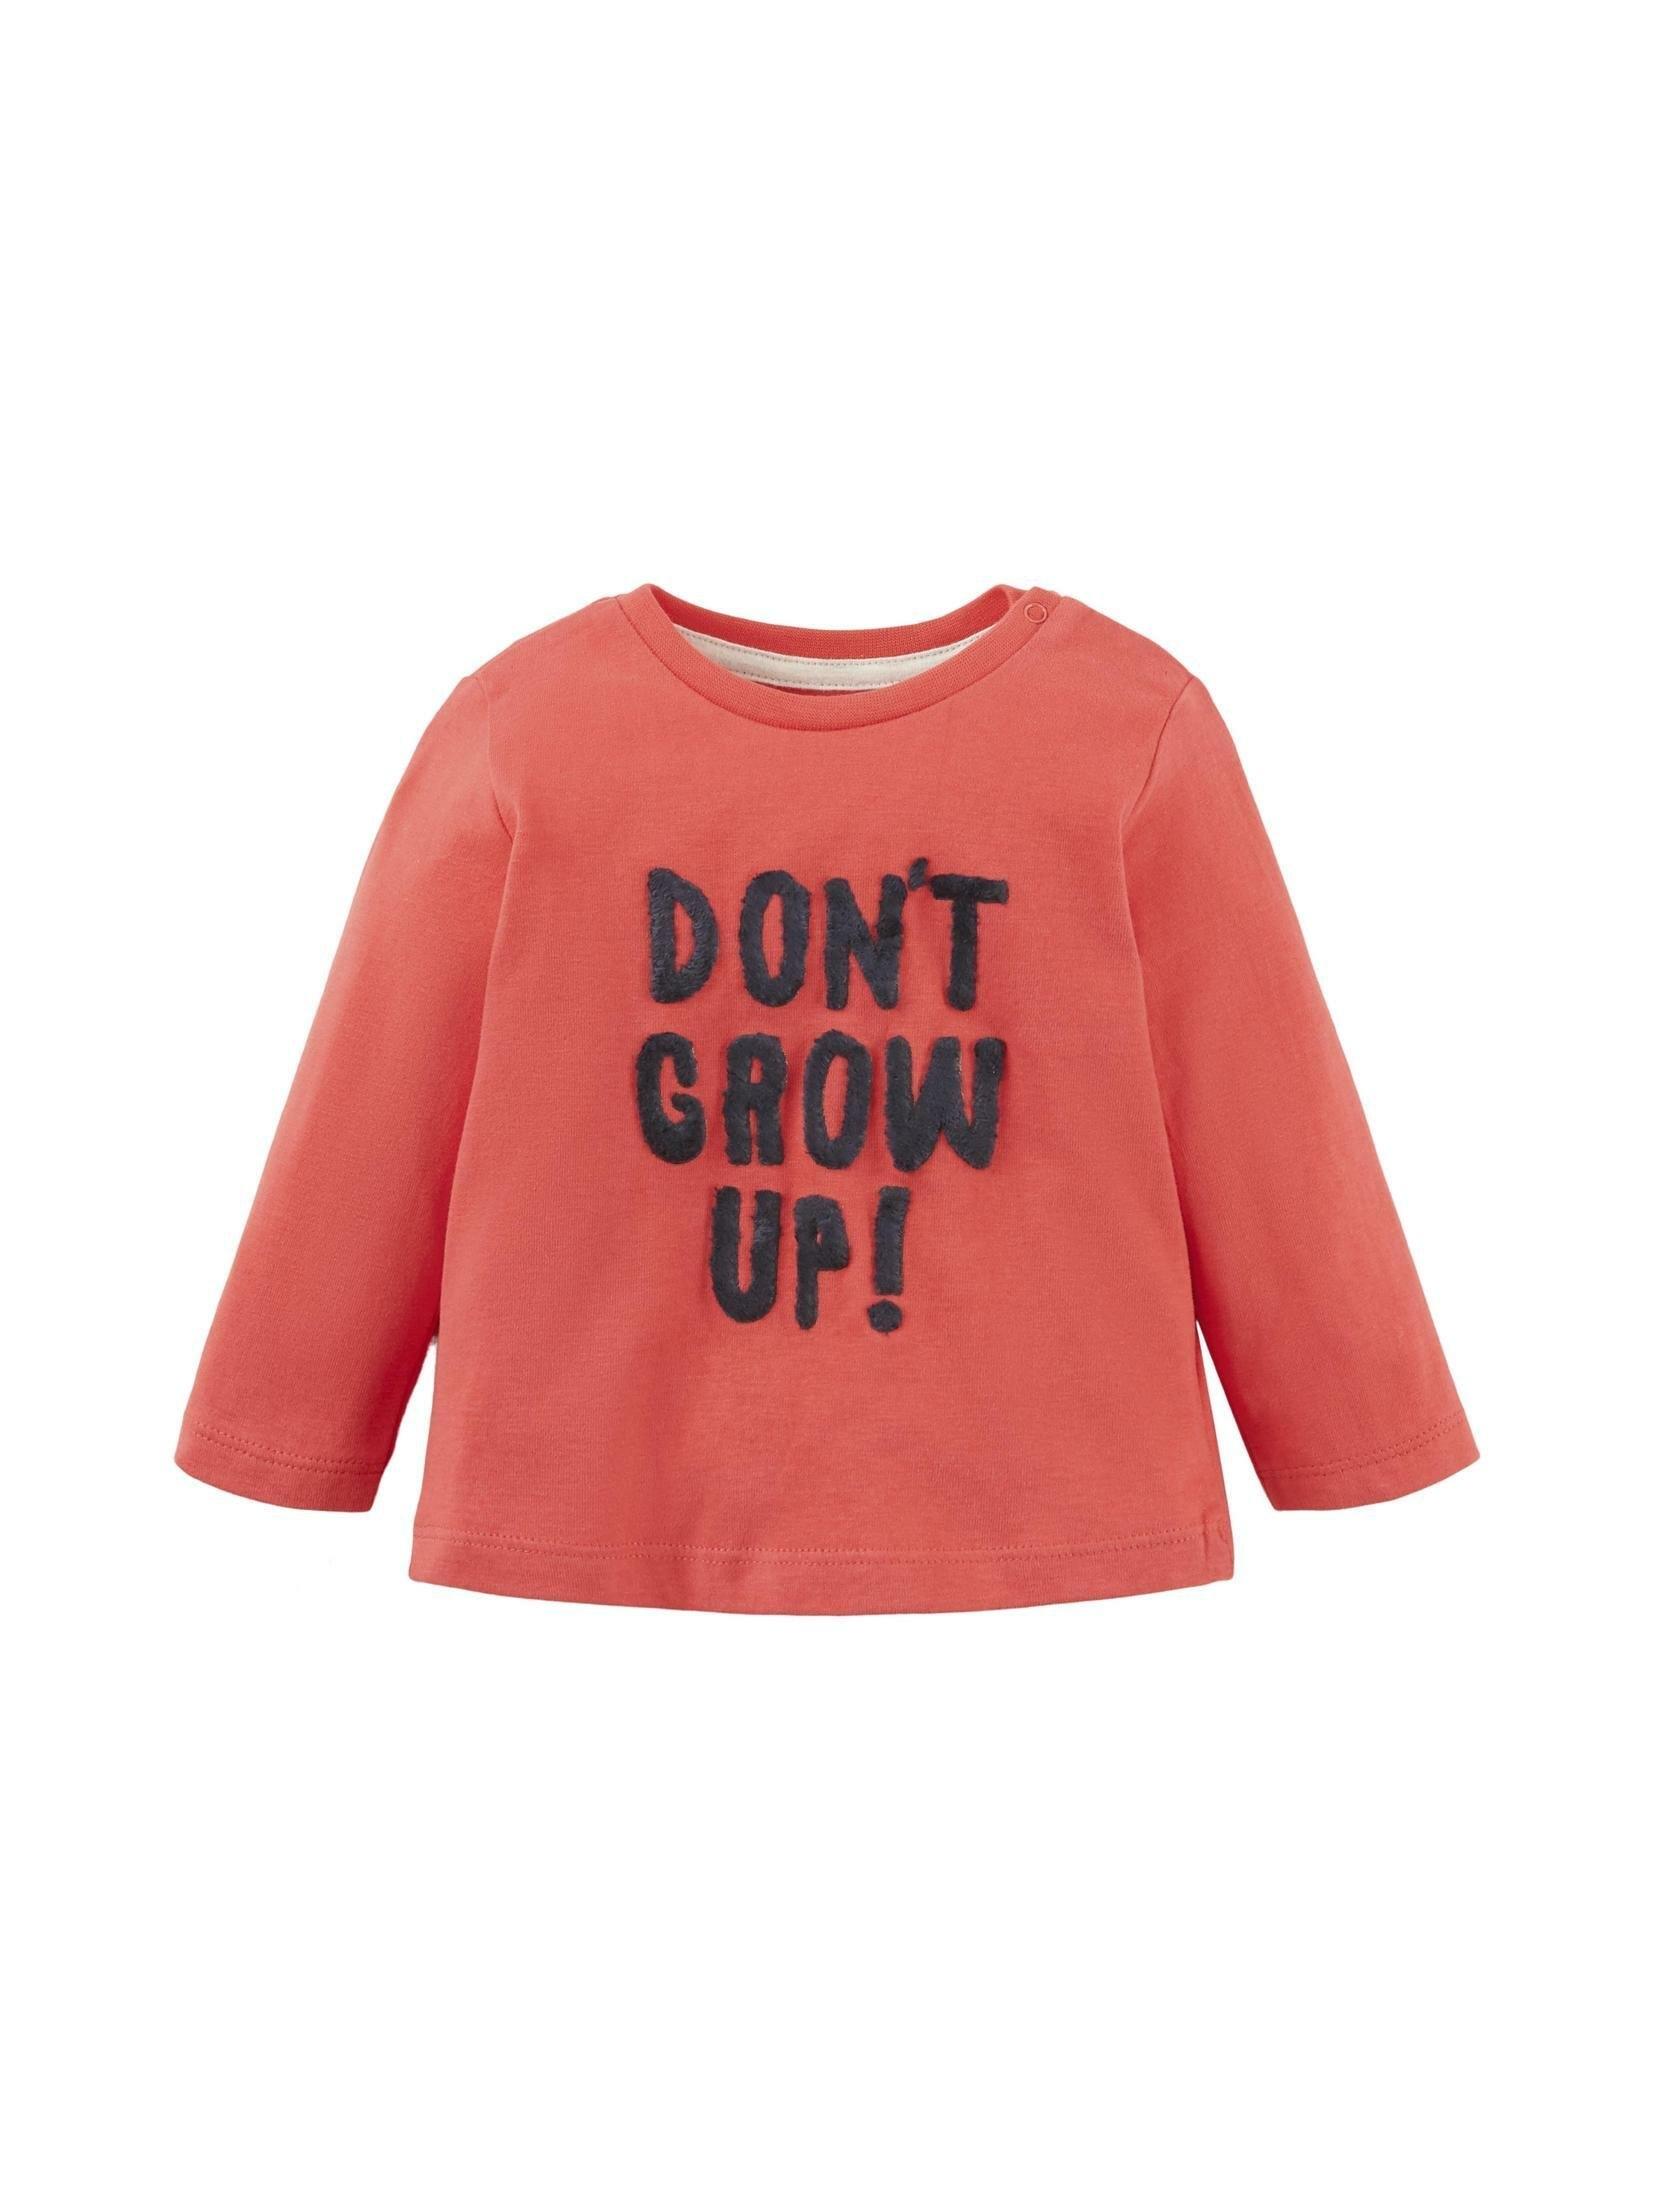 TOM TAILOR shirt met lange mouwen »Langarmshirt mit Artwork« bij OTTO online kopen